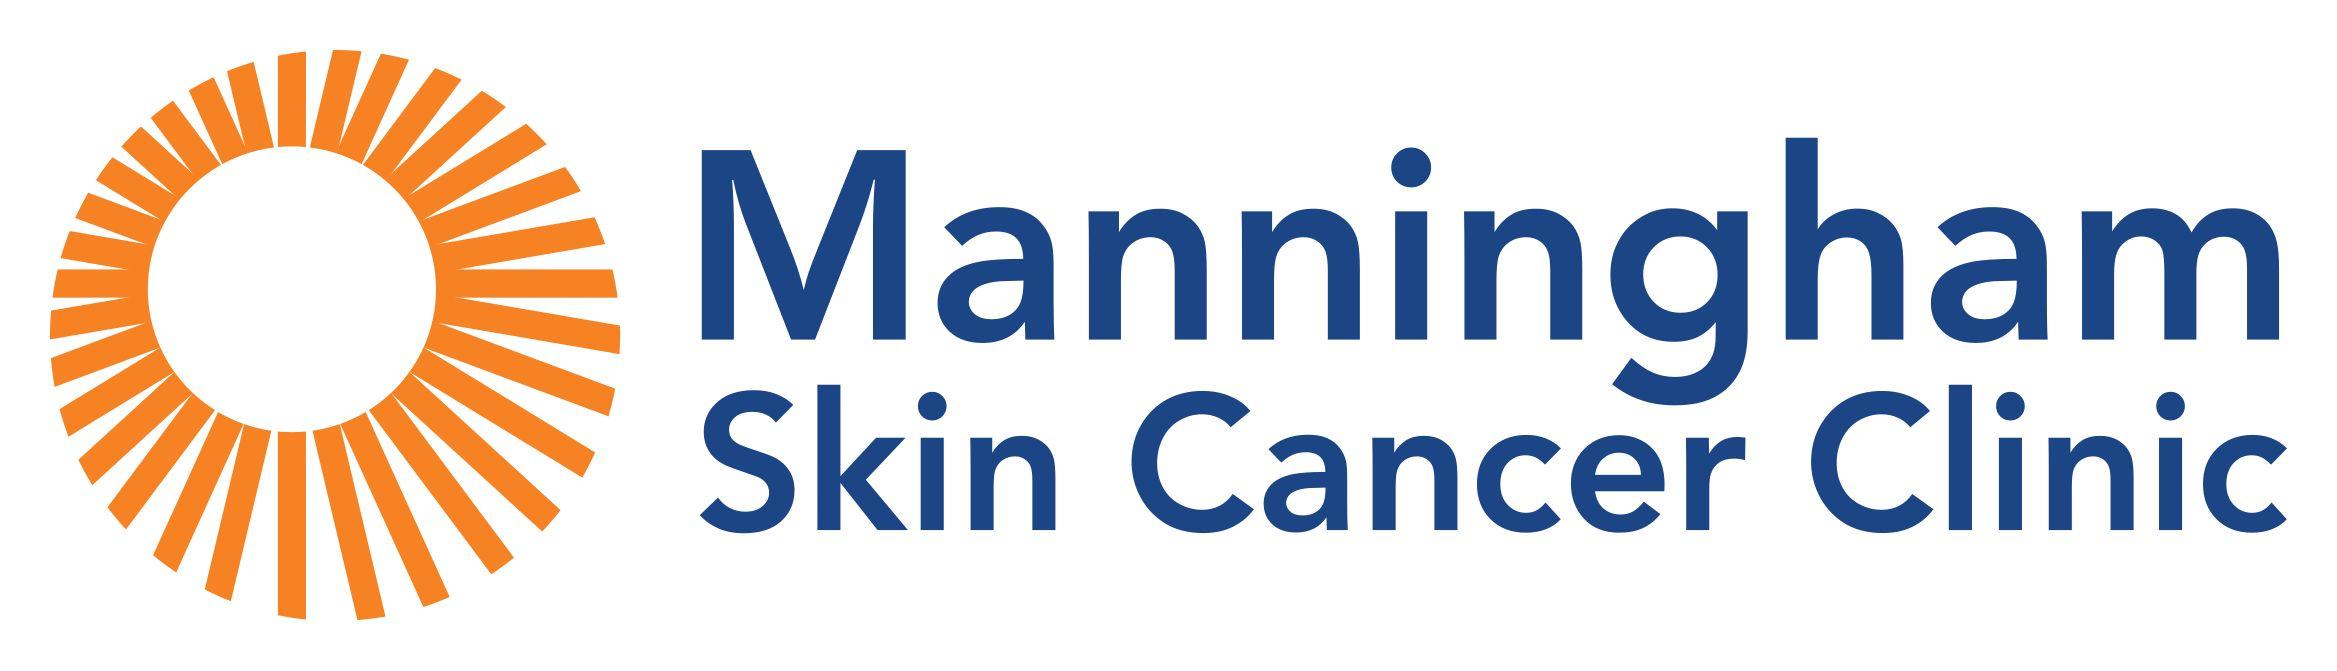 Manningham Skin Cancer Clinic Logo